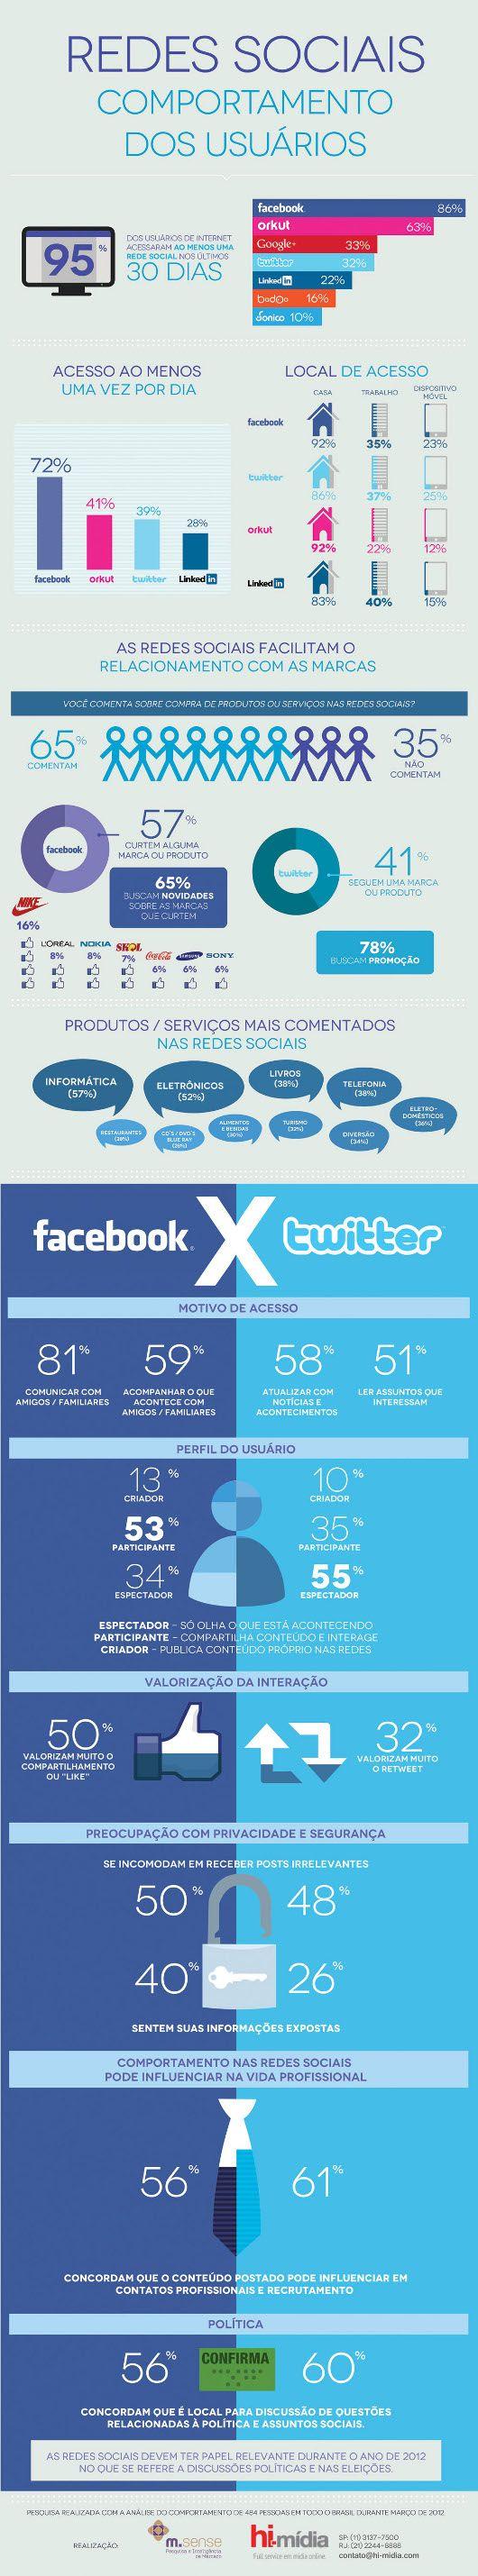 Comportamento dos usuários nas Redes Sociais (Facebook, Orkut, Twitter, Google+, Linkedin, Comportamento_Usuarios)